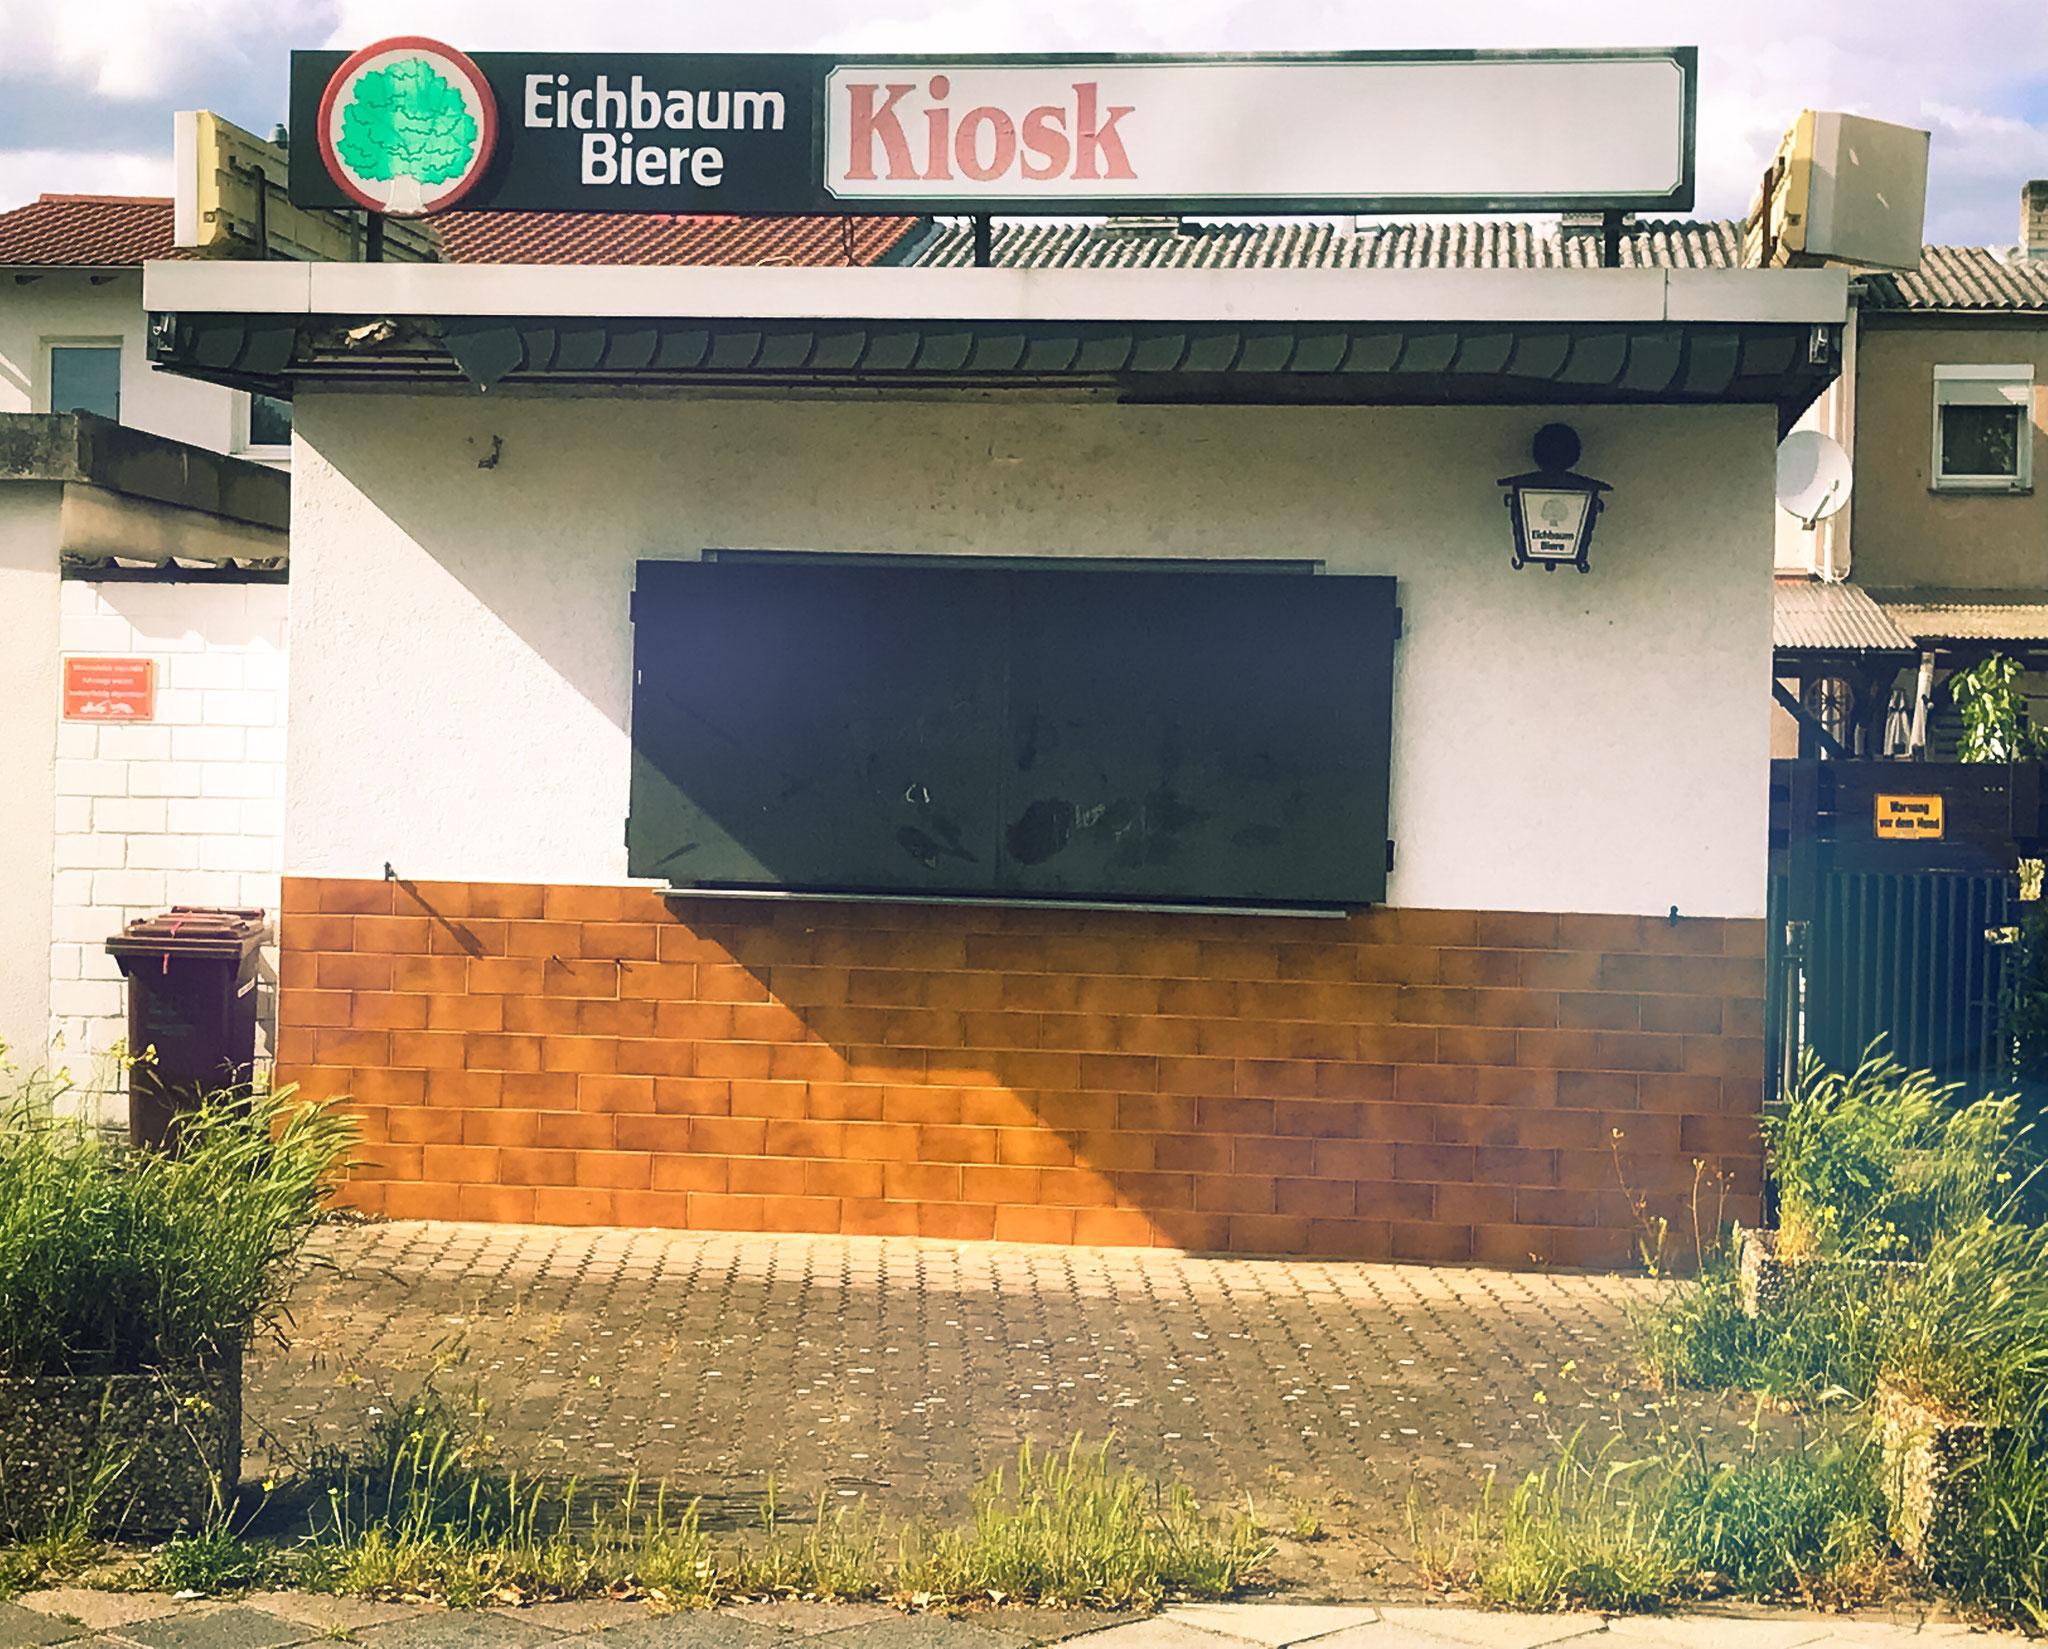 Lost Kiosk, Speyer